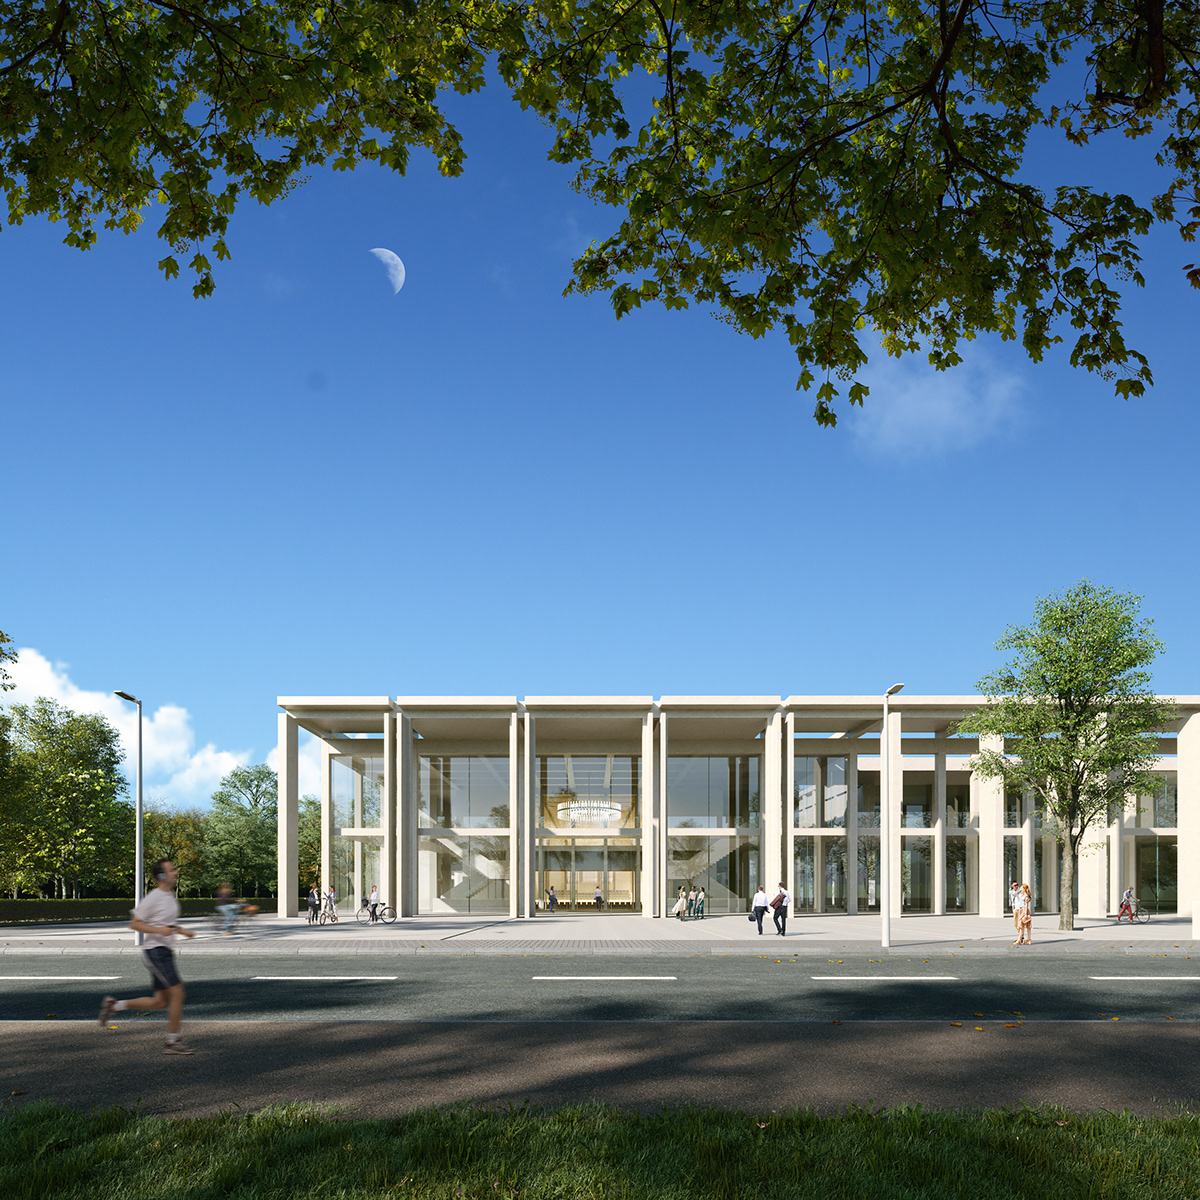 3D architecture archviz CG CGI Competition Music Center visualization win